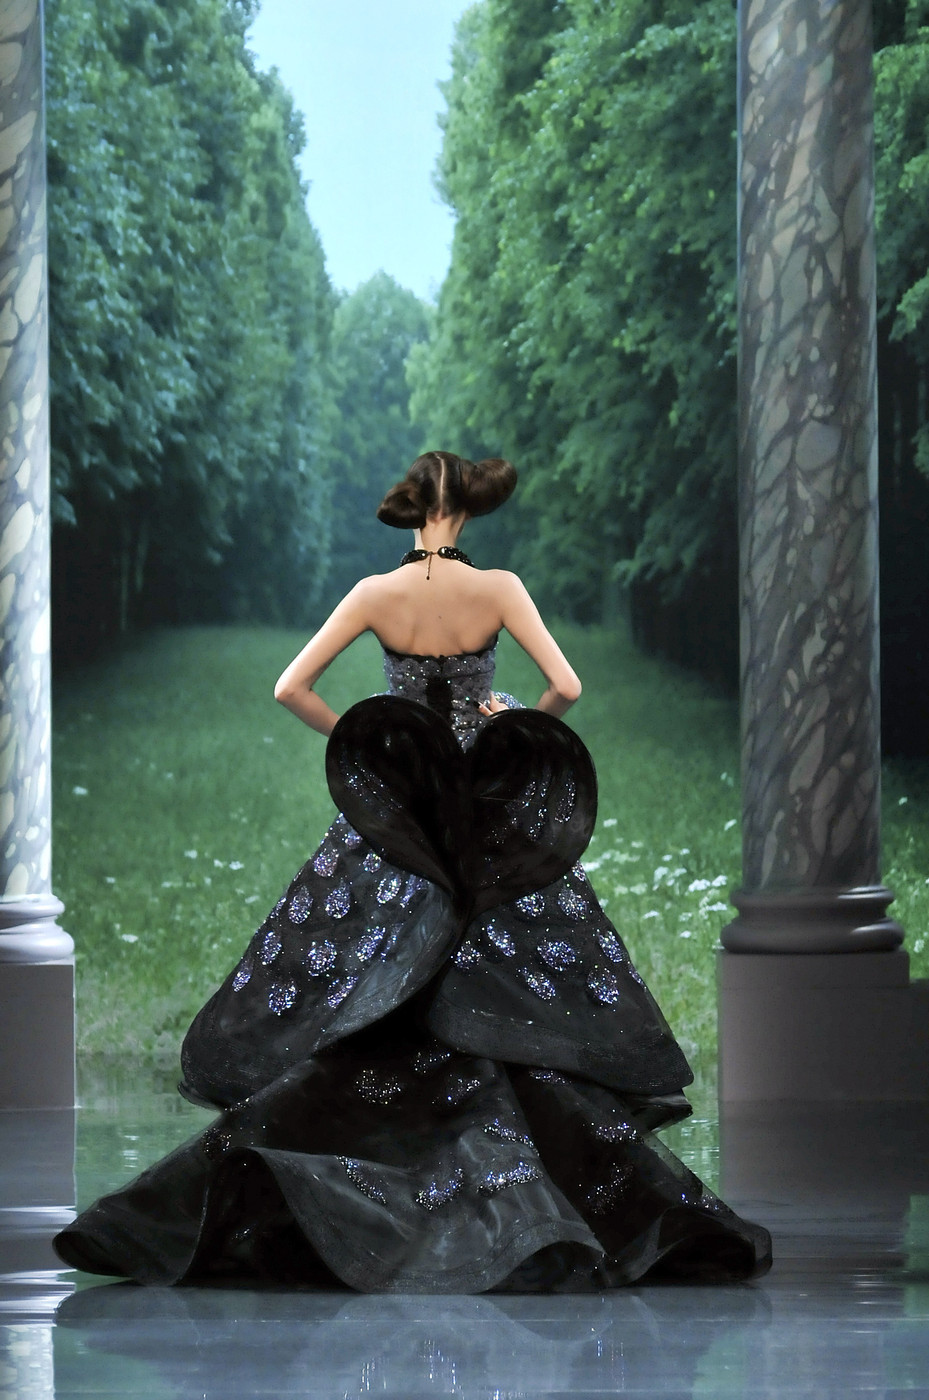 fay-wray :     Christian Dior Fall/Winter 2008 Haute Couture